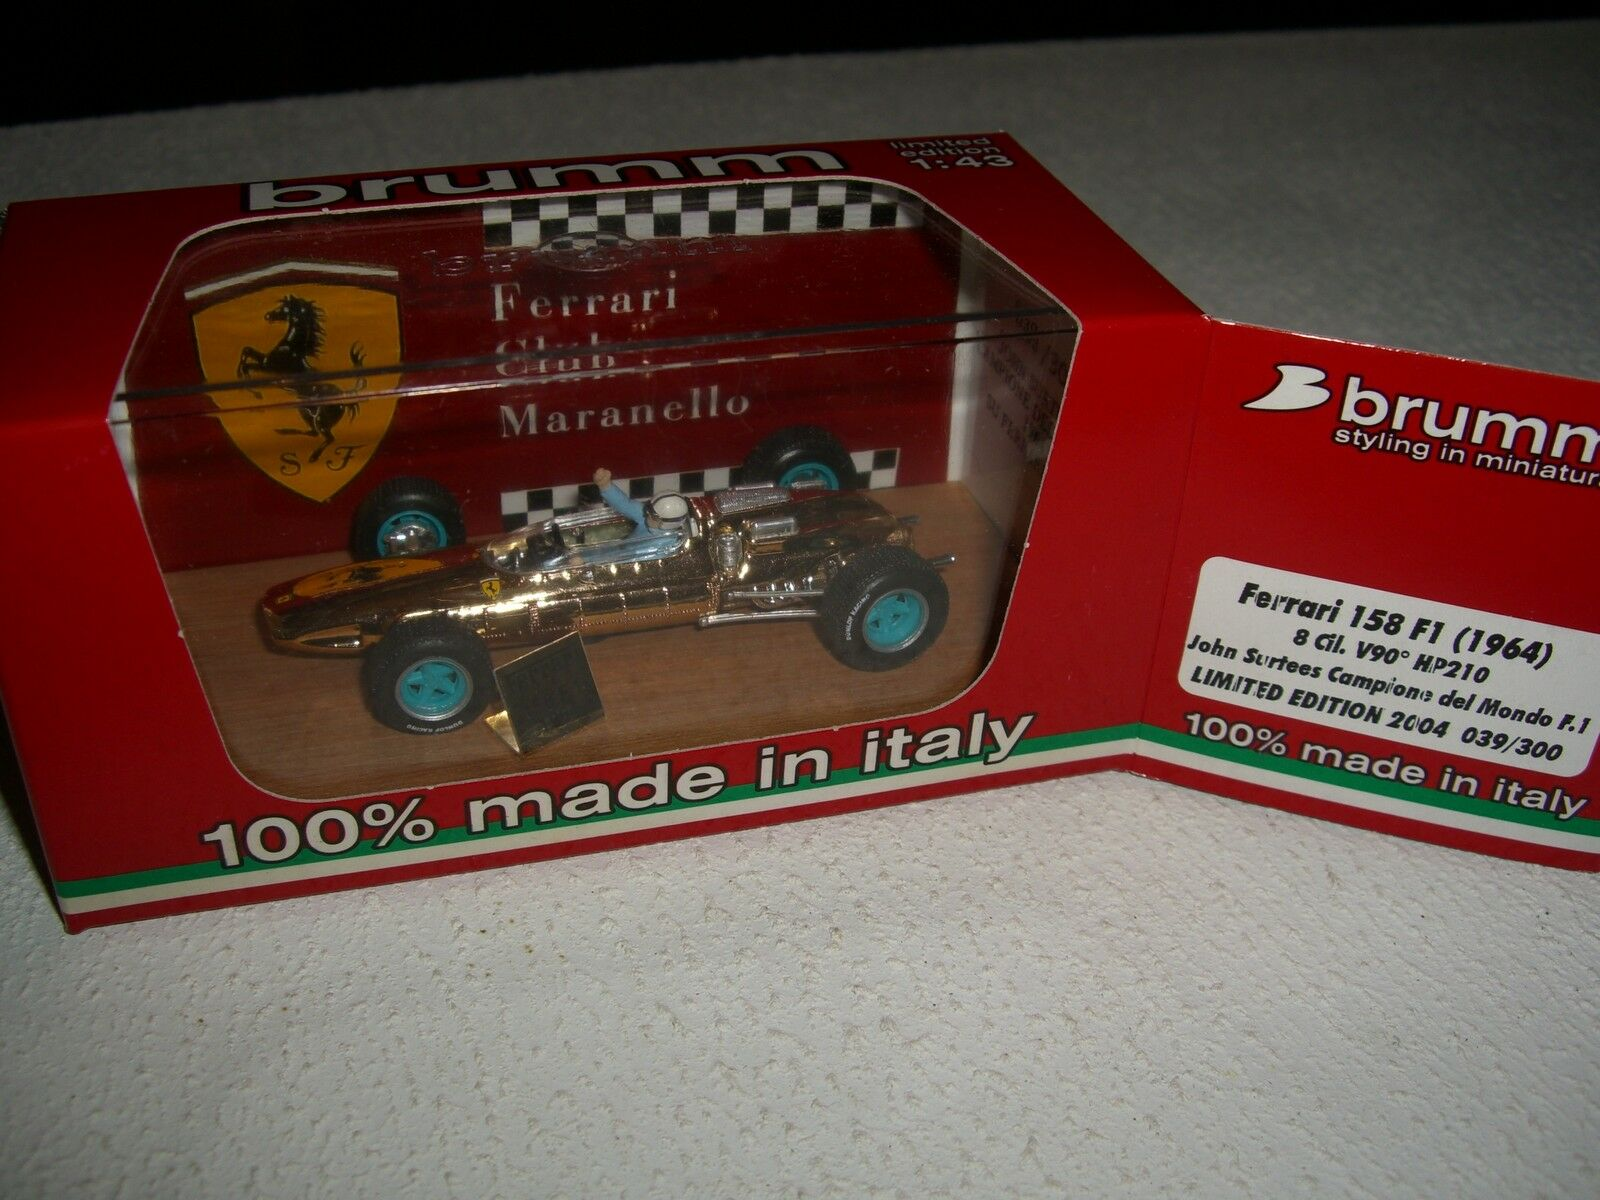 F1 Ferrari Club Maranello 158 f1 1964 J. Surtees L. Edition 300 pcs 1 43